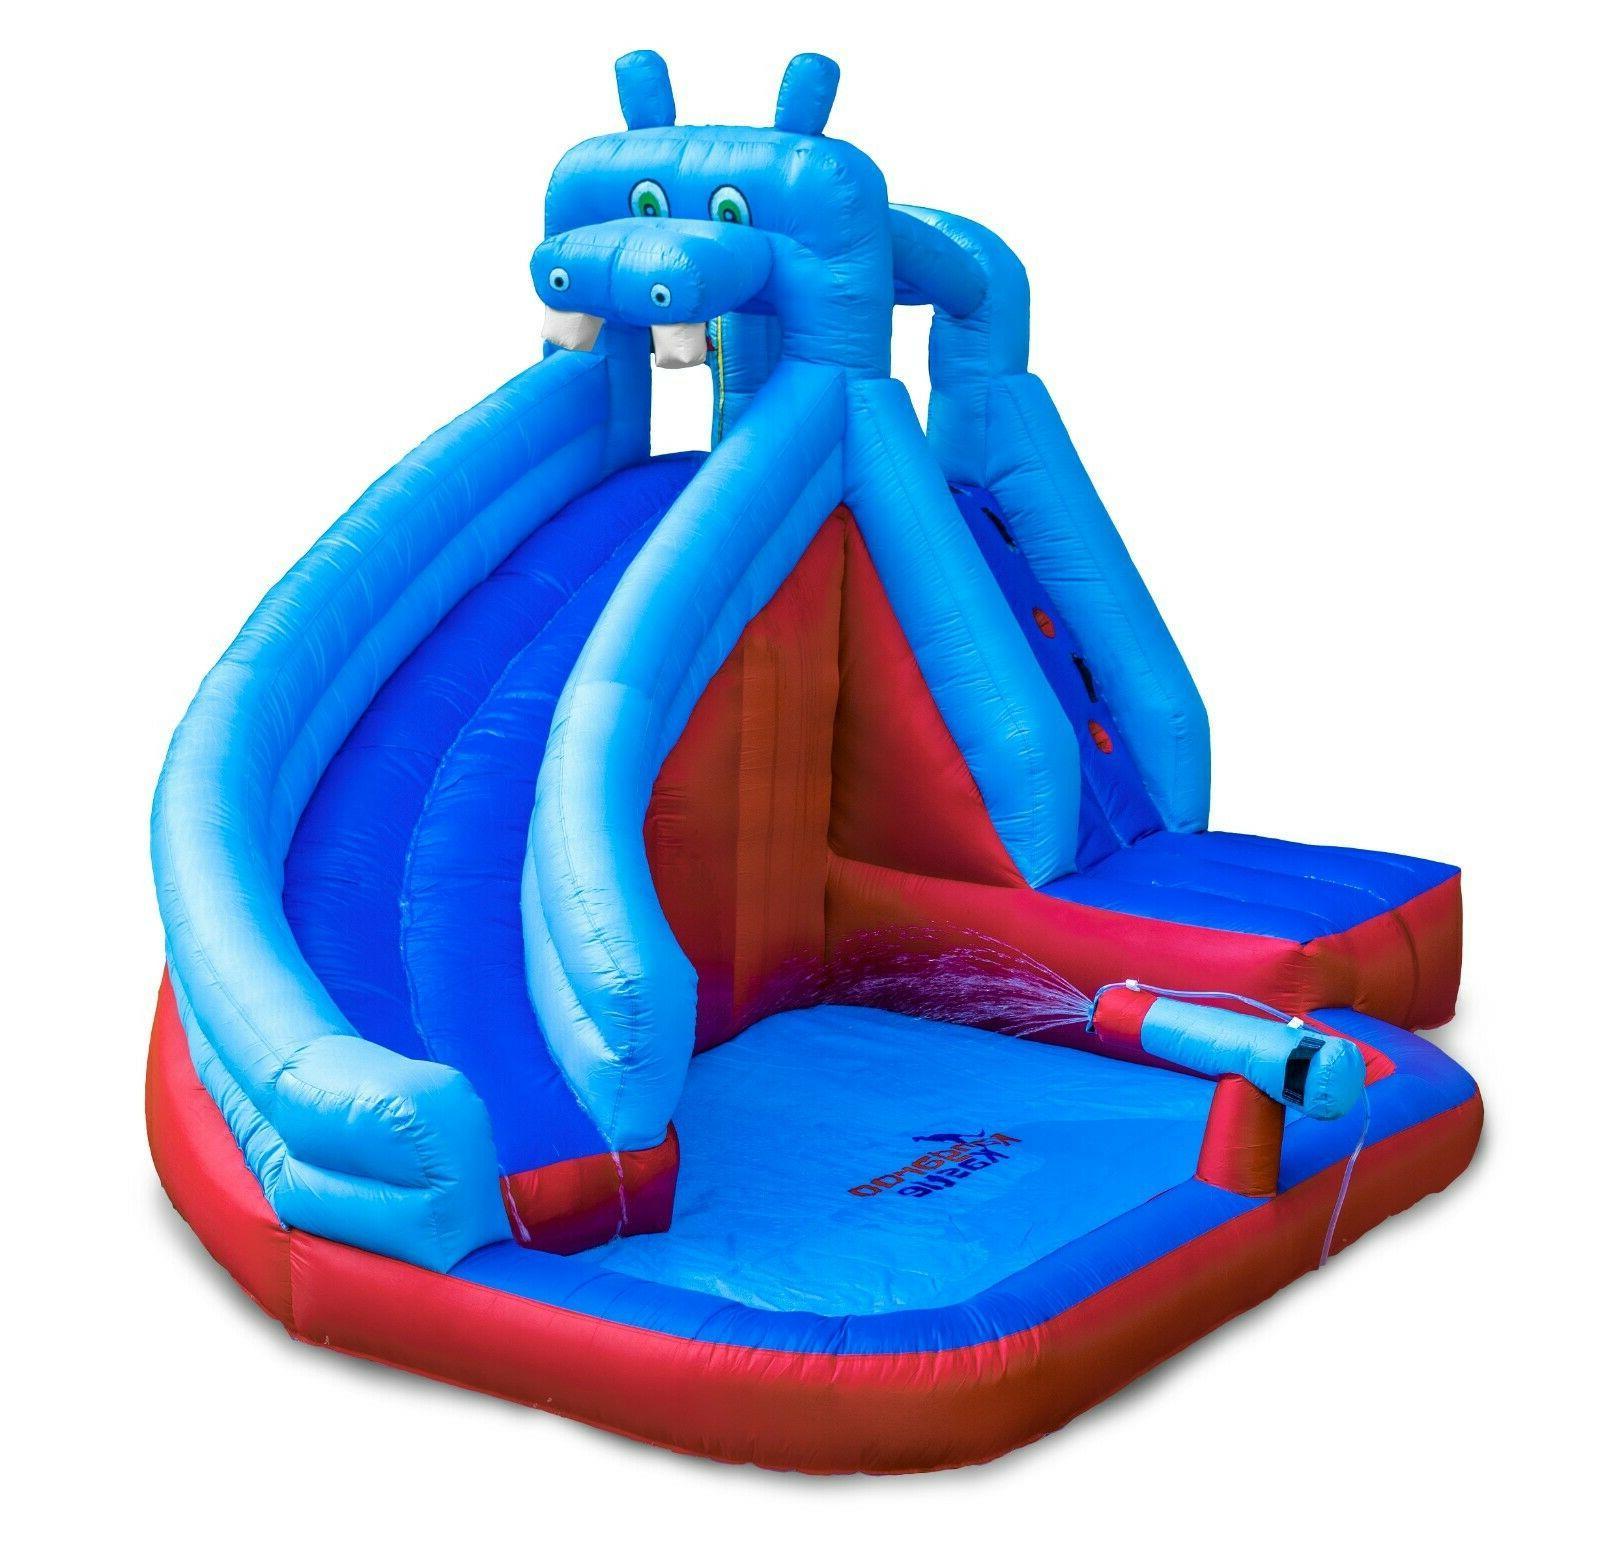 Inflatable Blower for Water Gun Splash Pool